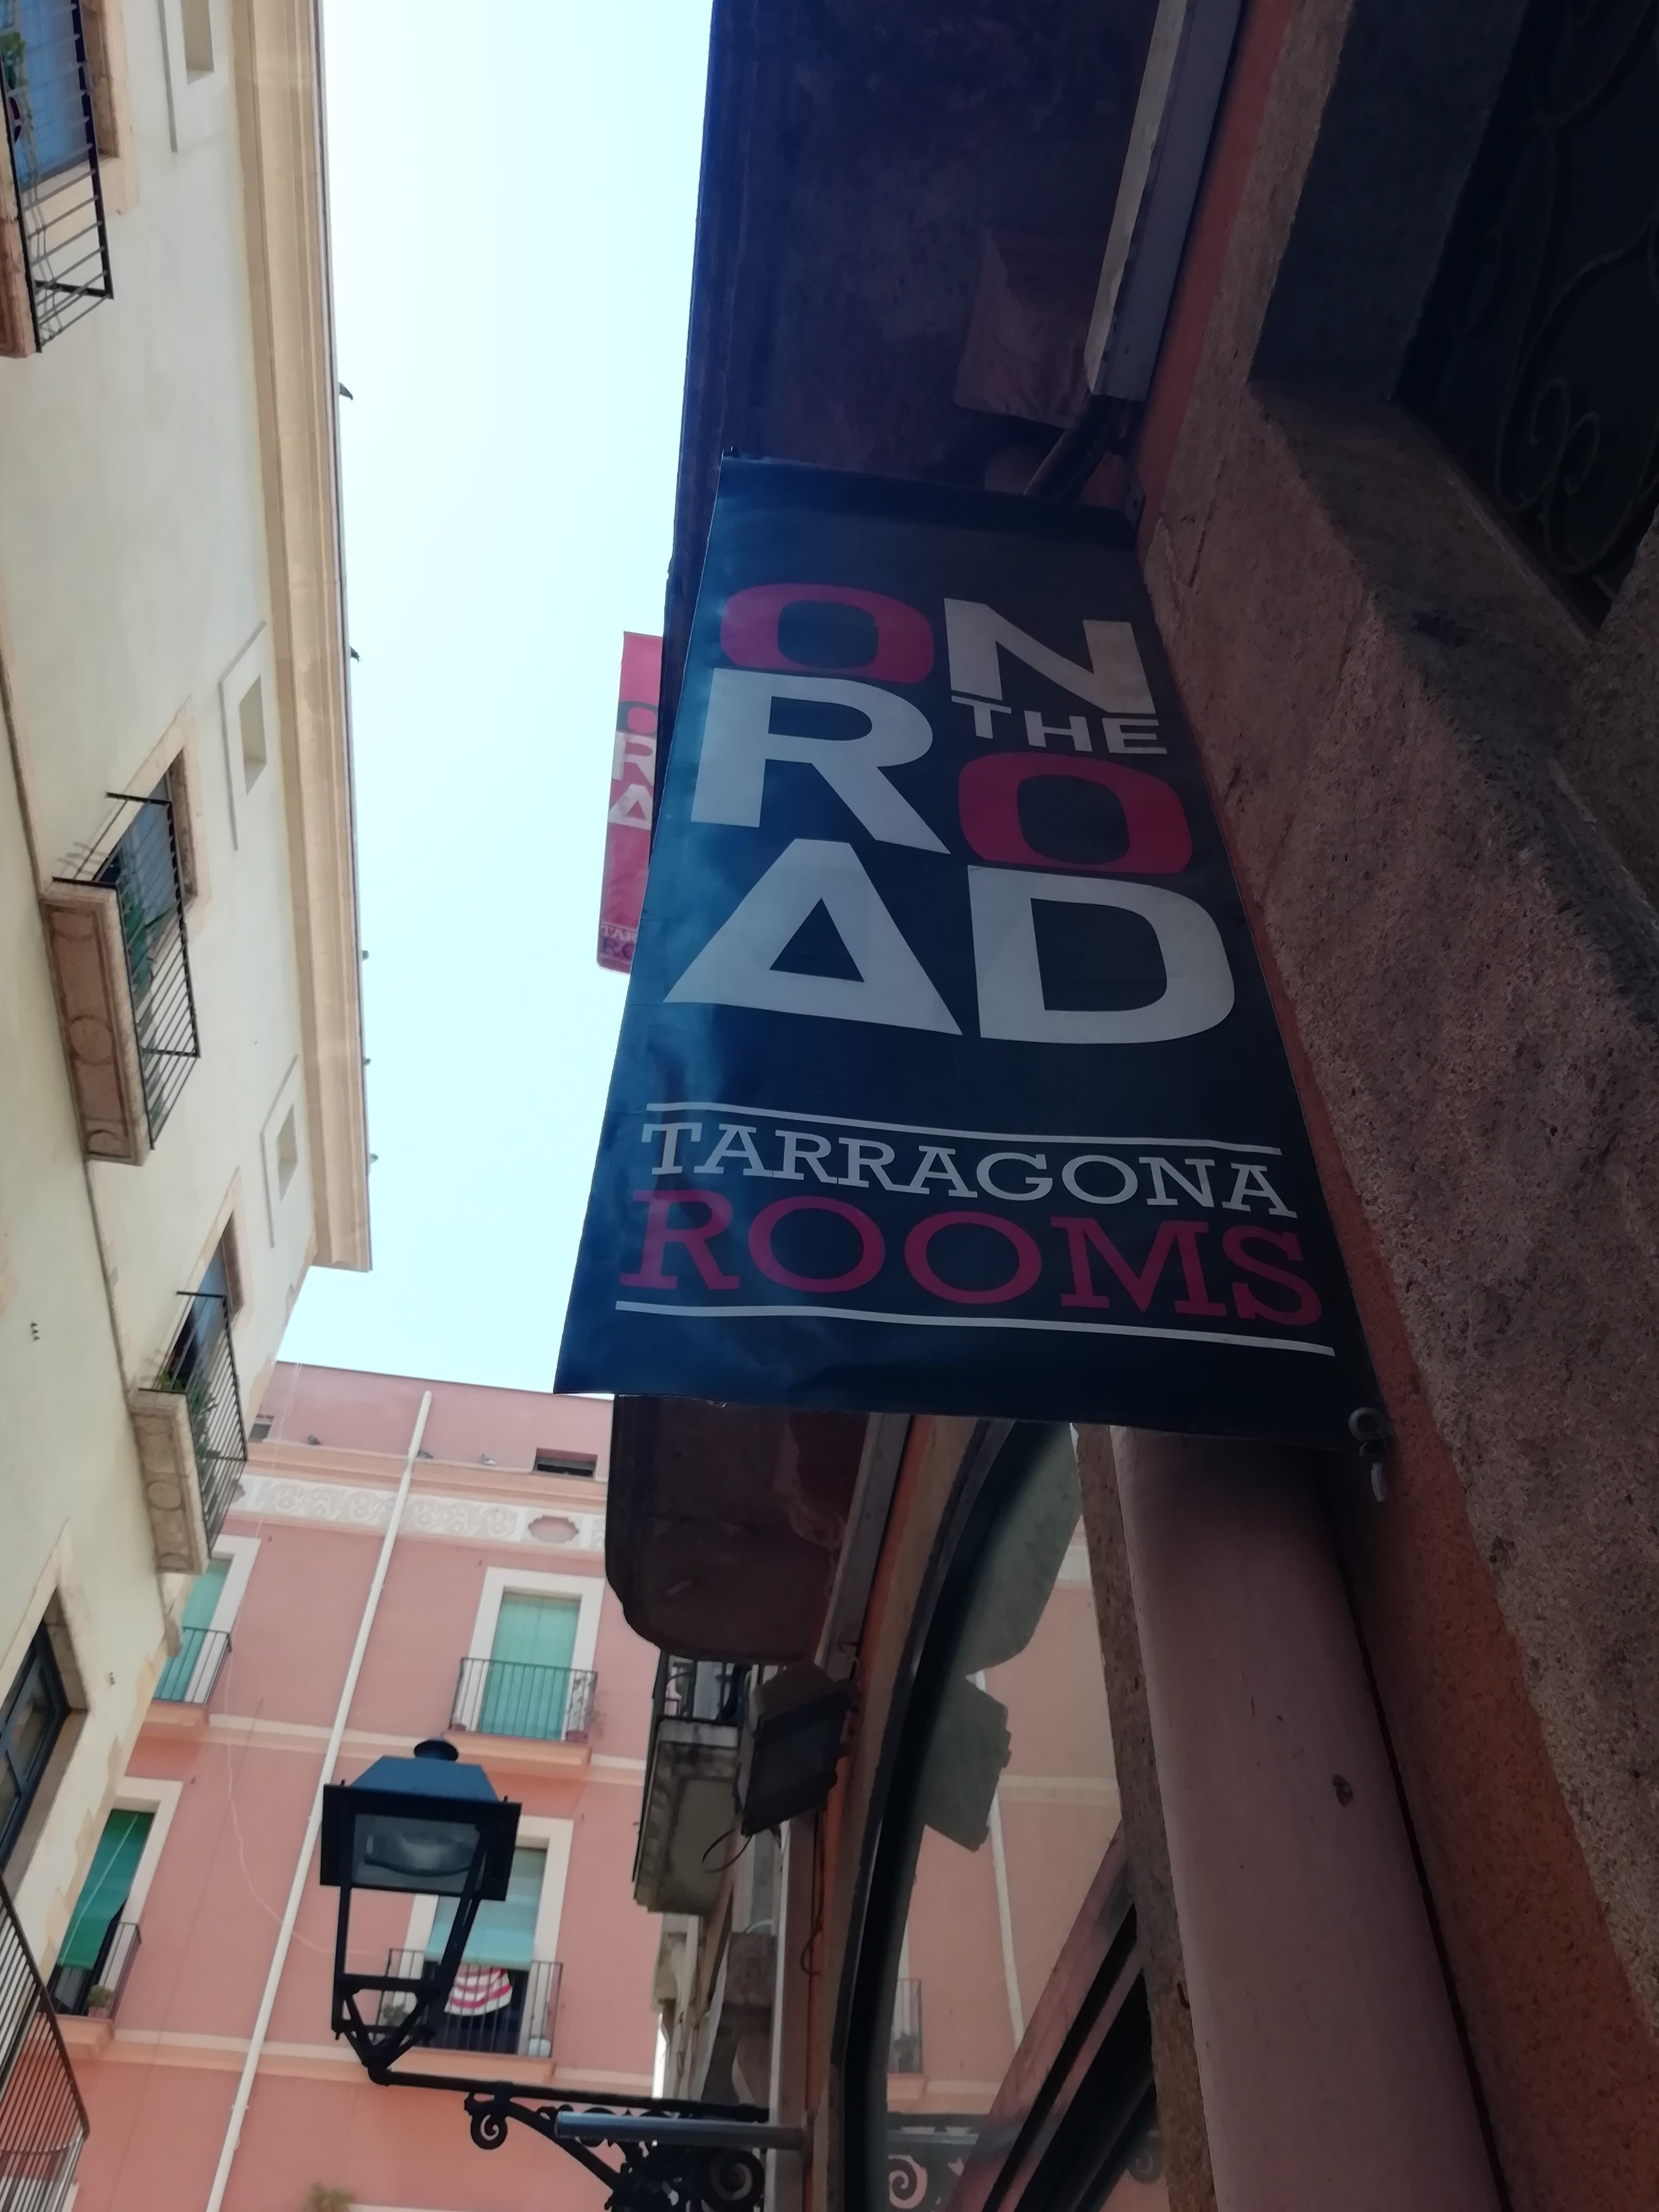 On the Road. Tarragona rooms